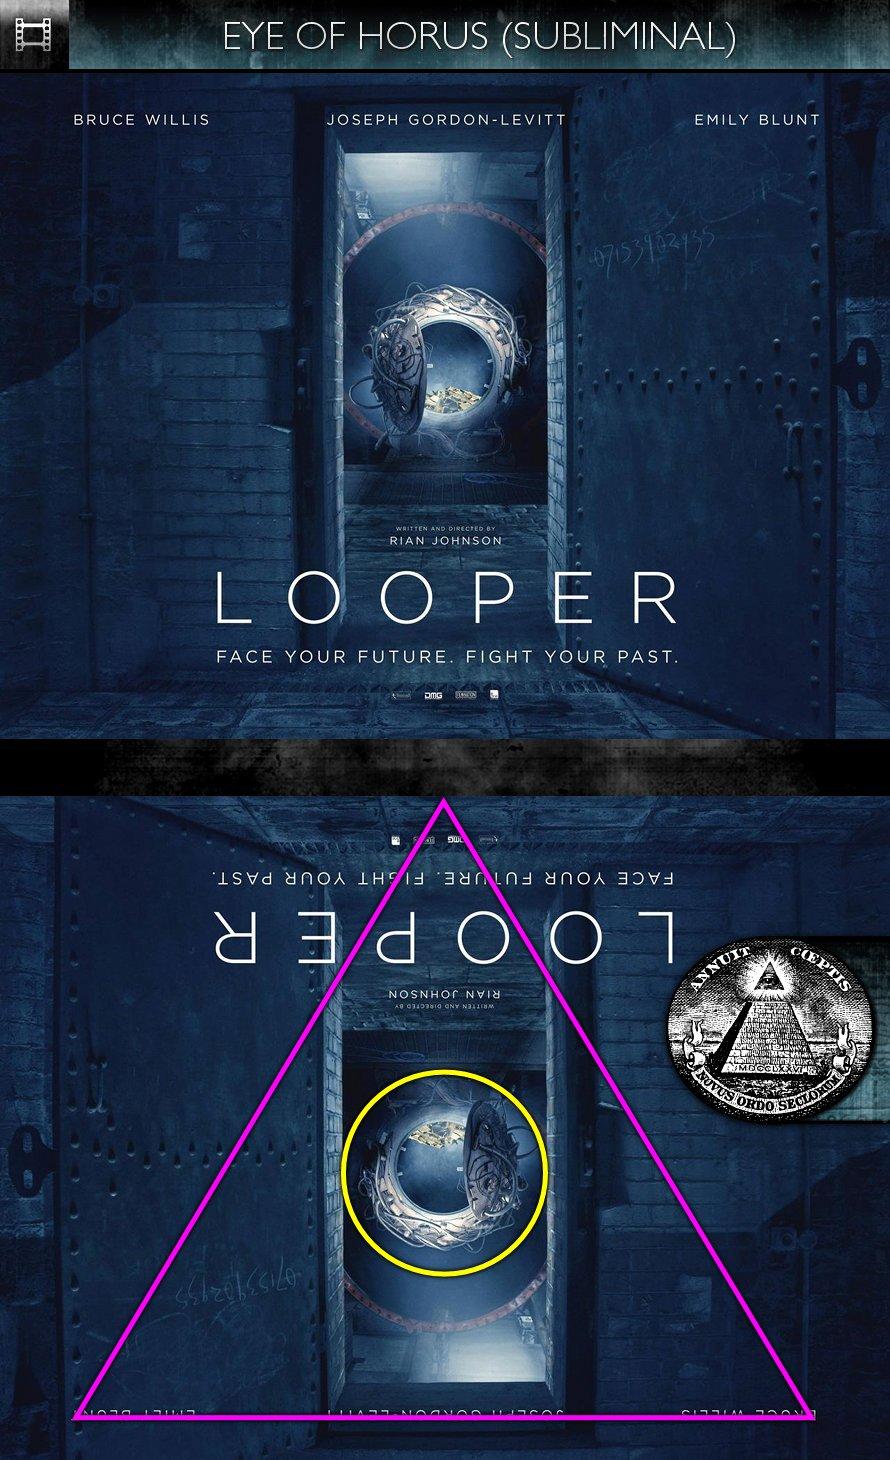 Looper - Poster - Eye of Horus - Subliminal